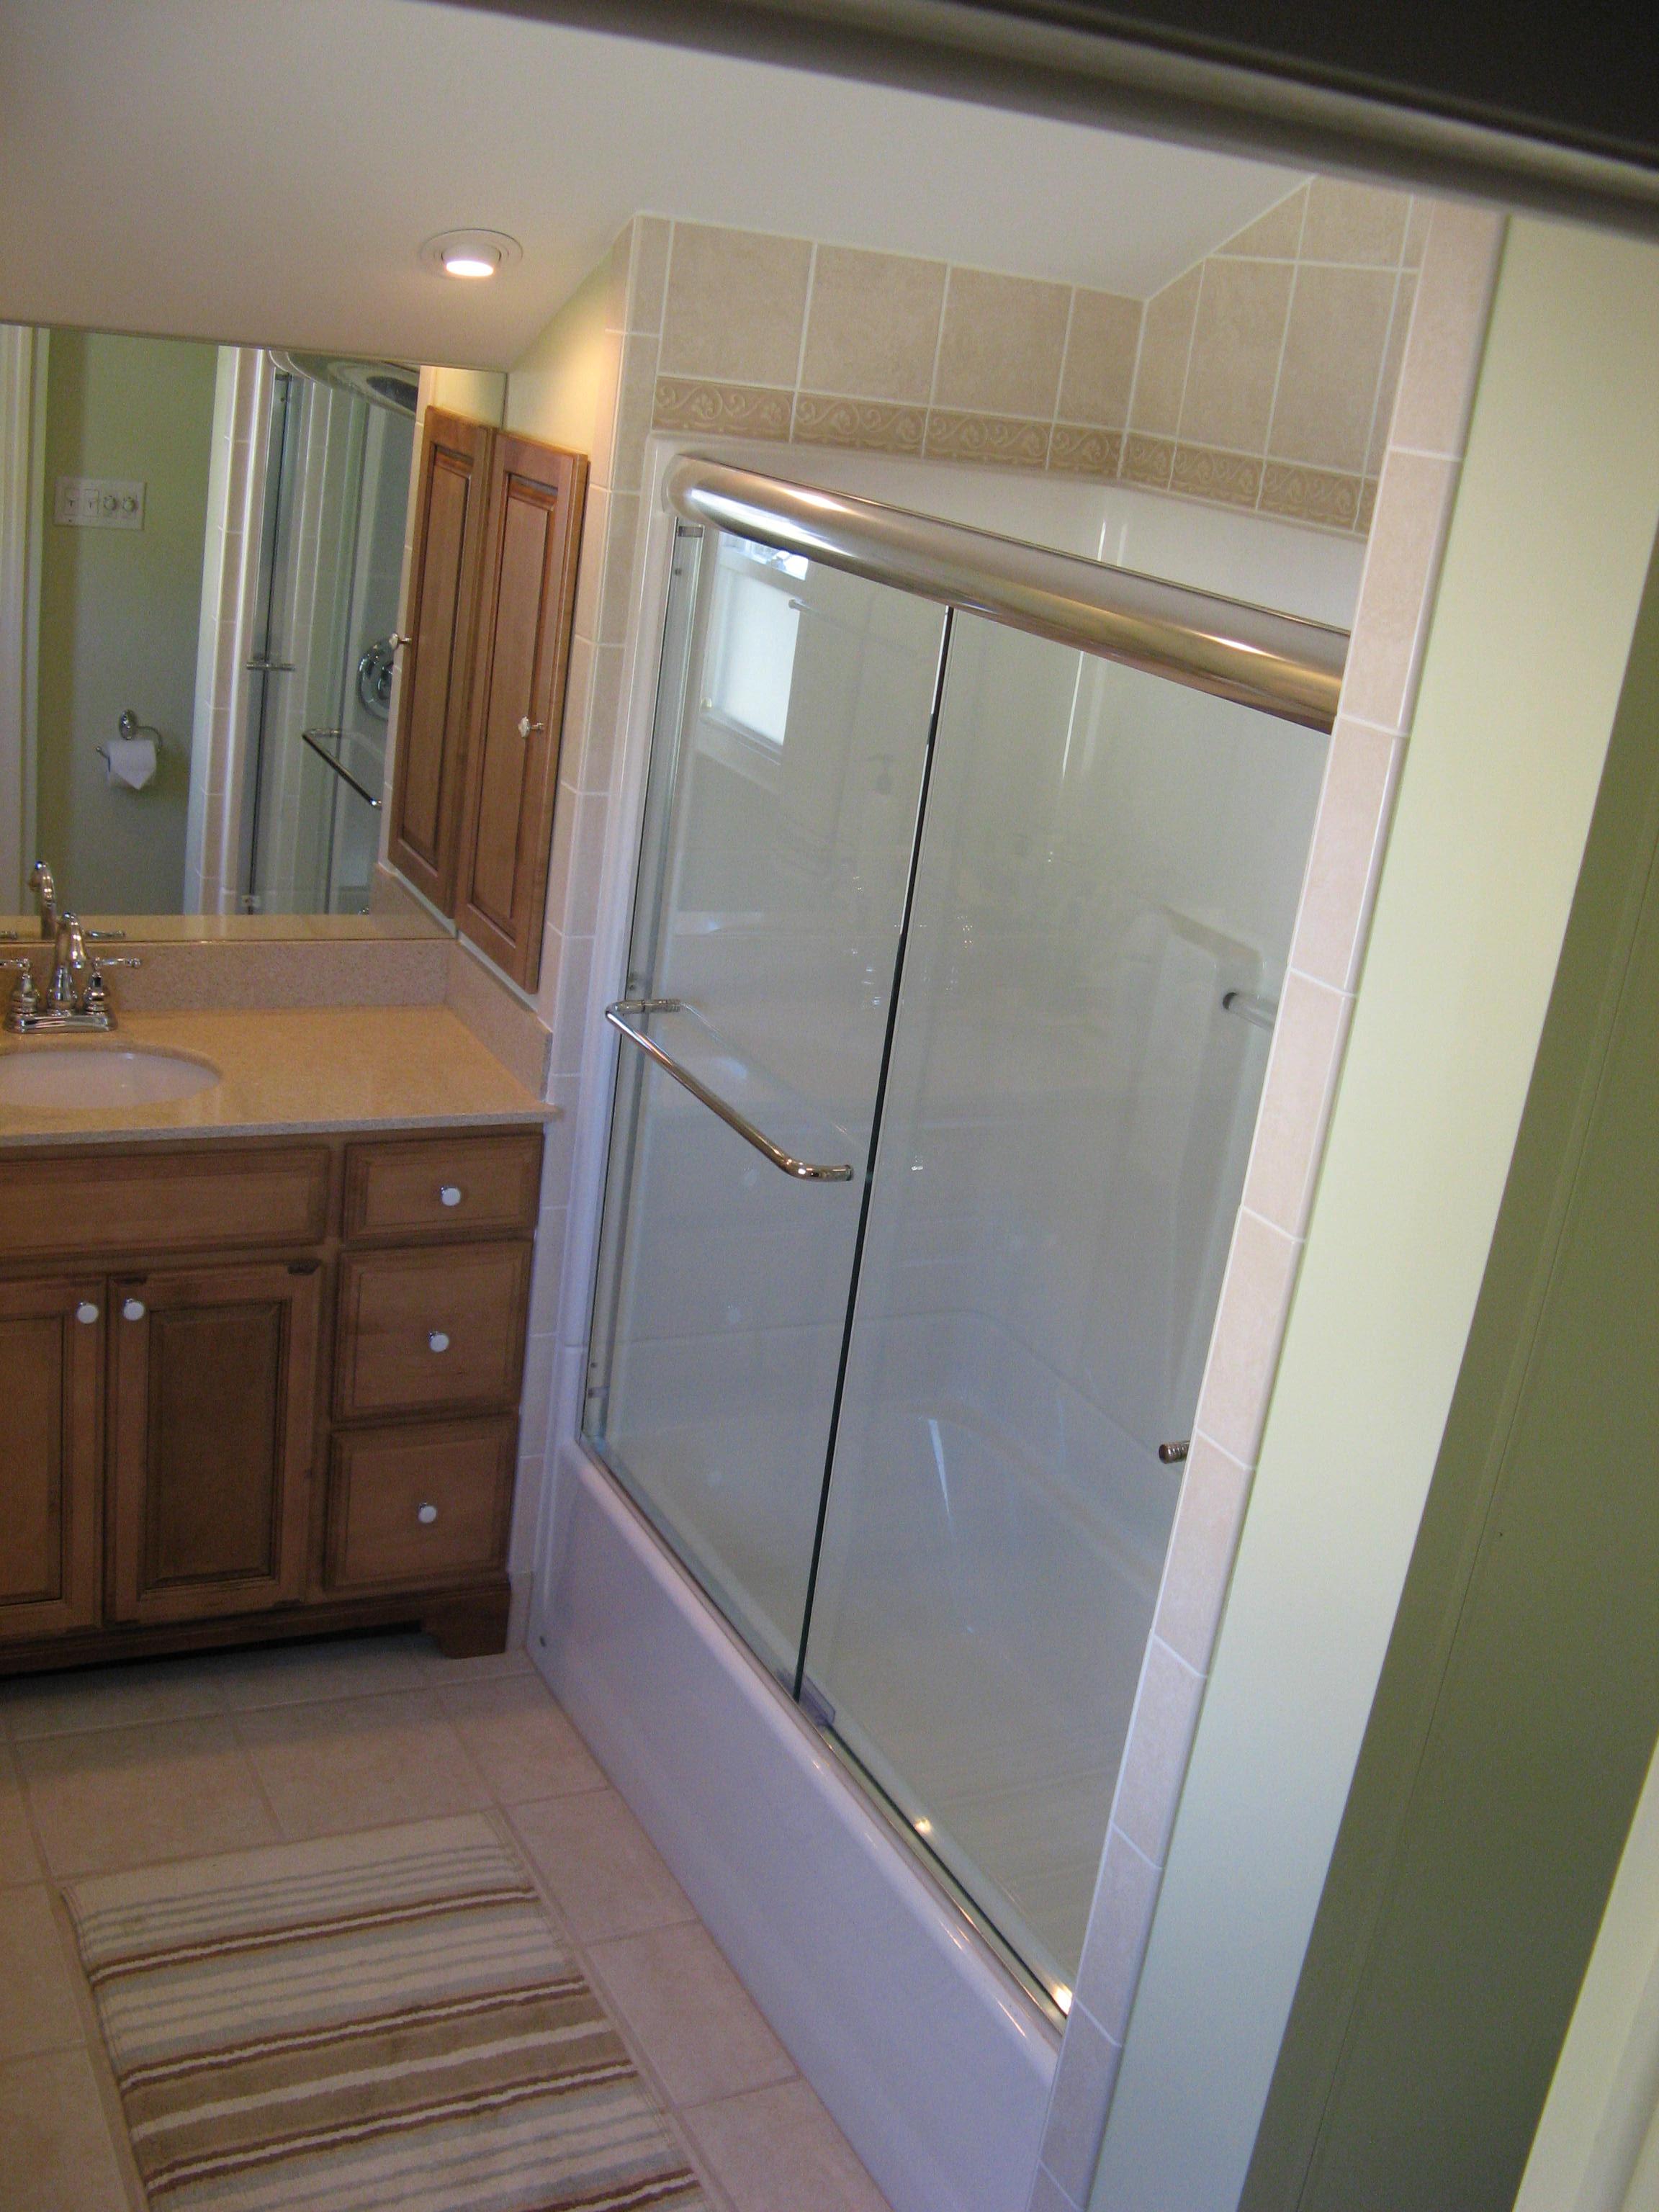 T L Drewes Home Improvements Amp Repairs Llc Morrisville